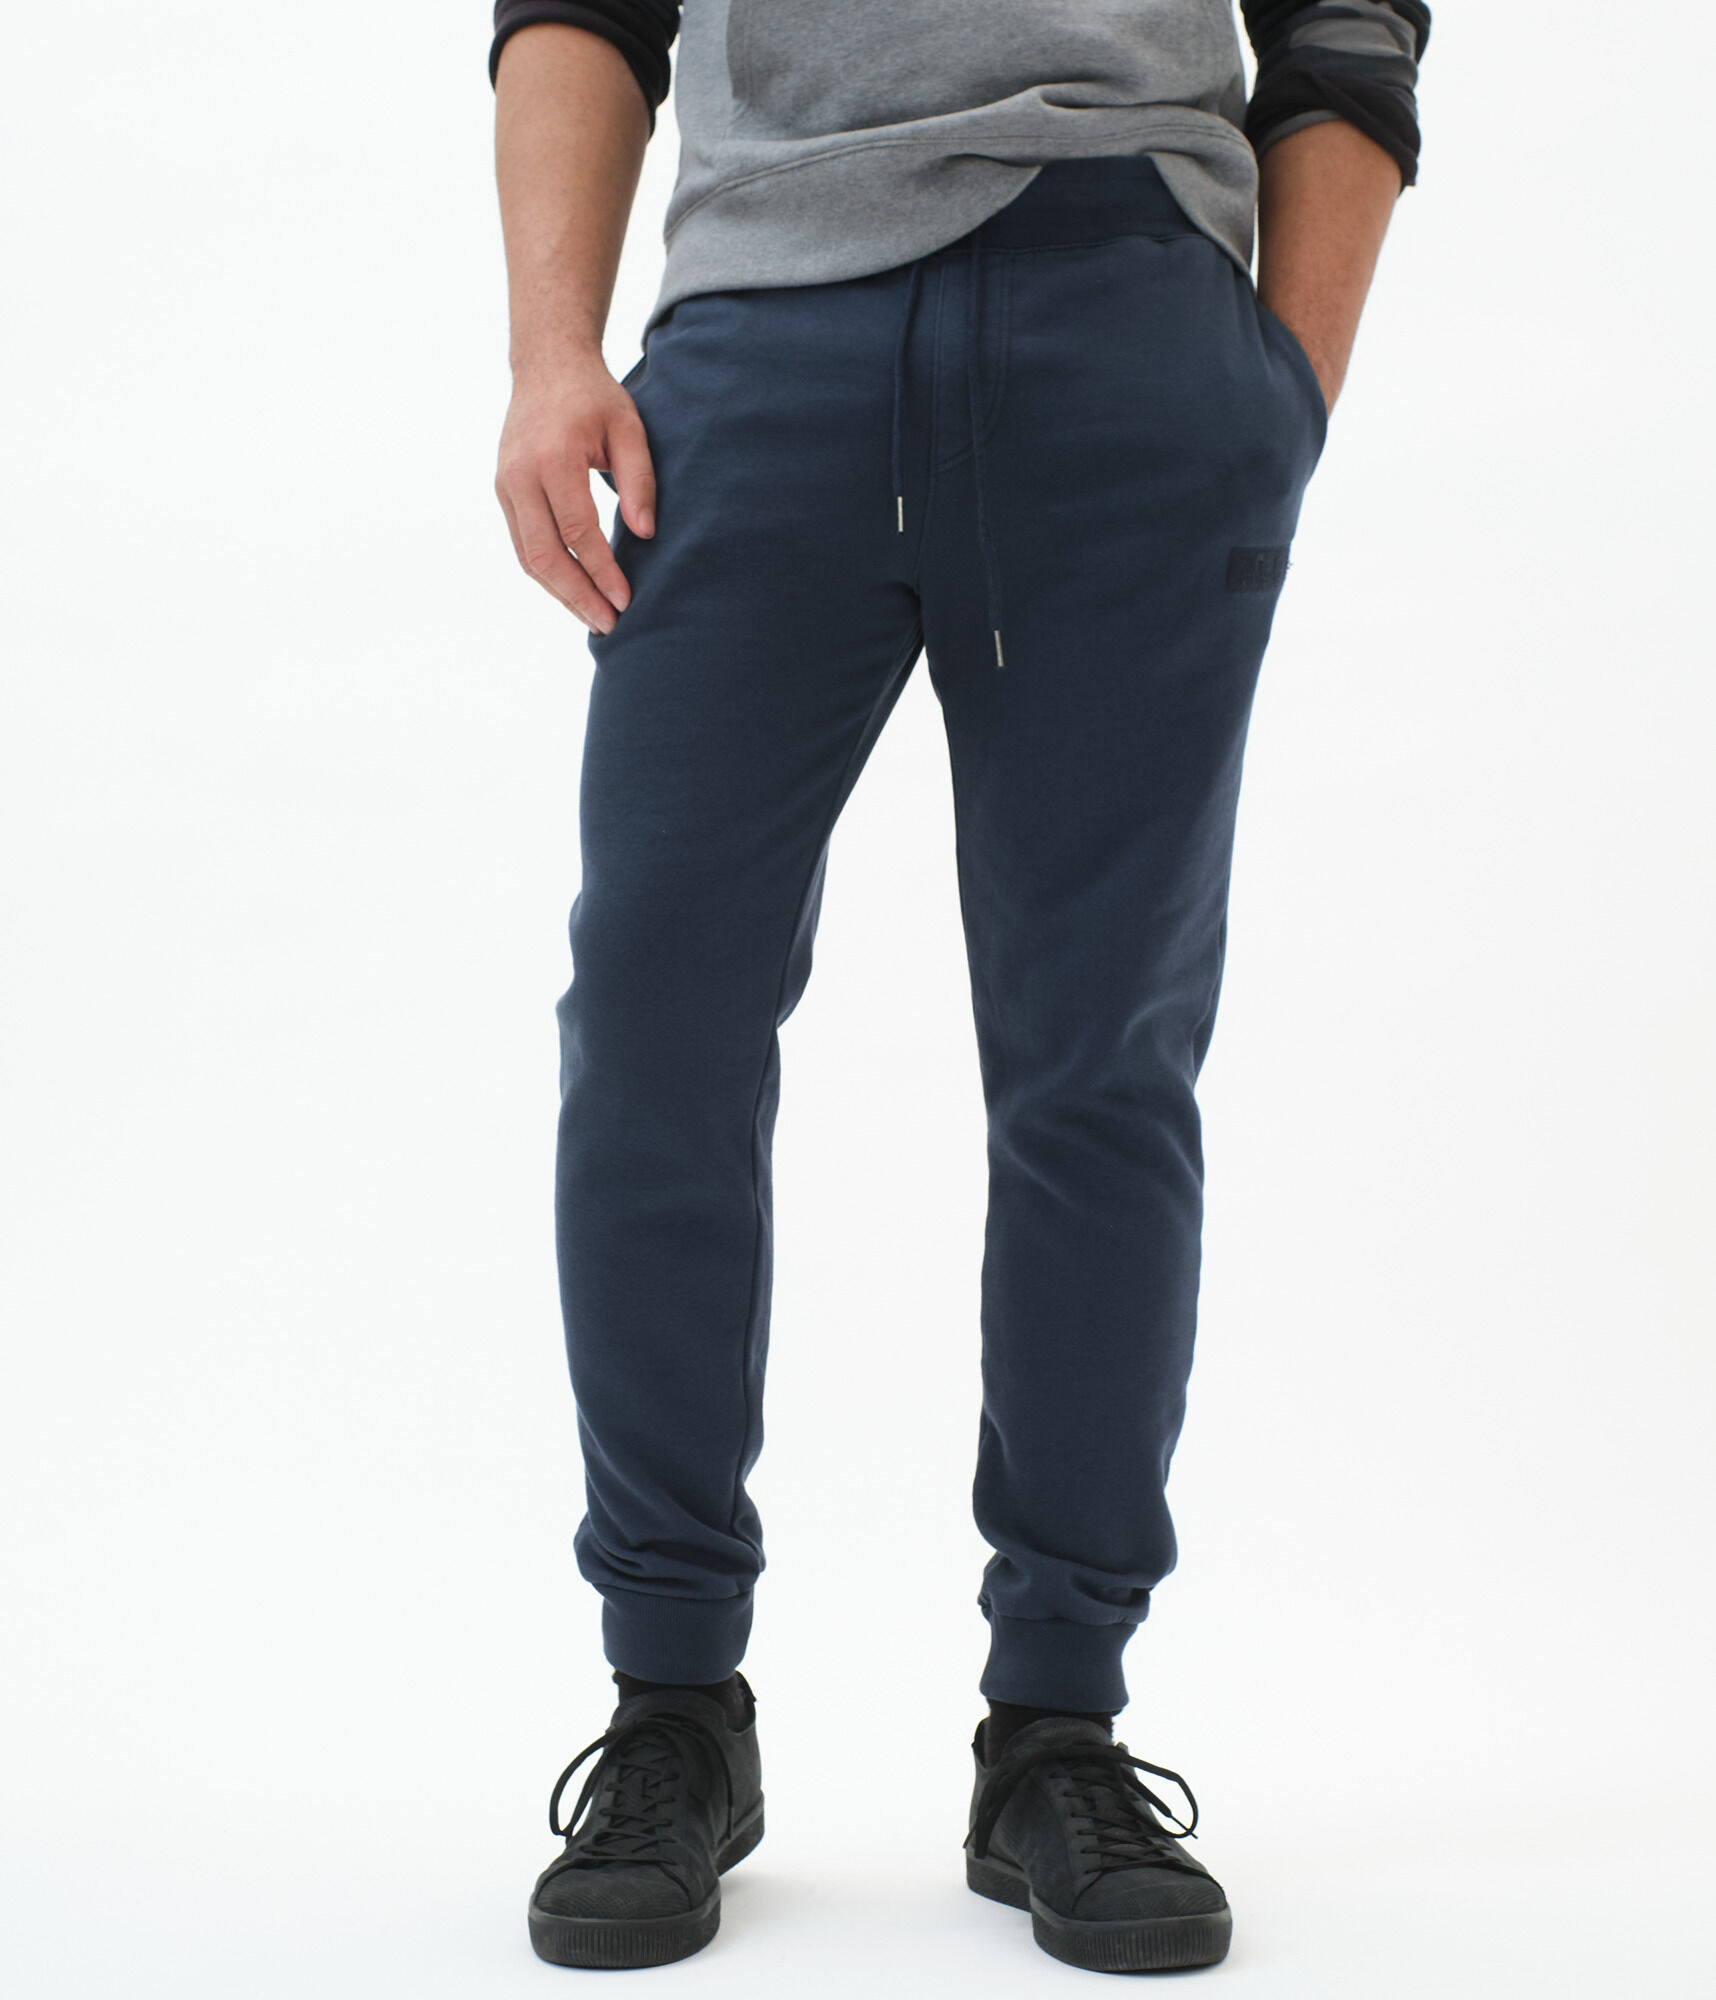 model wearing navy jogger sweatpants